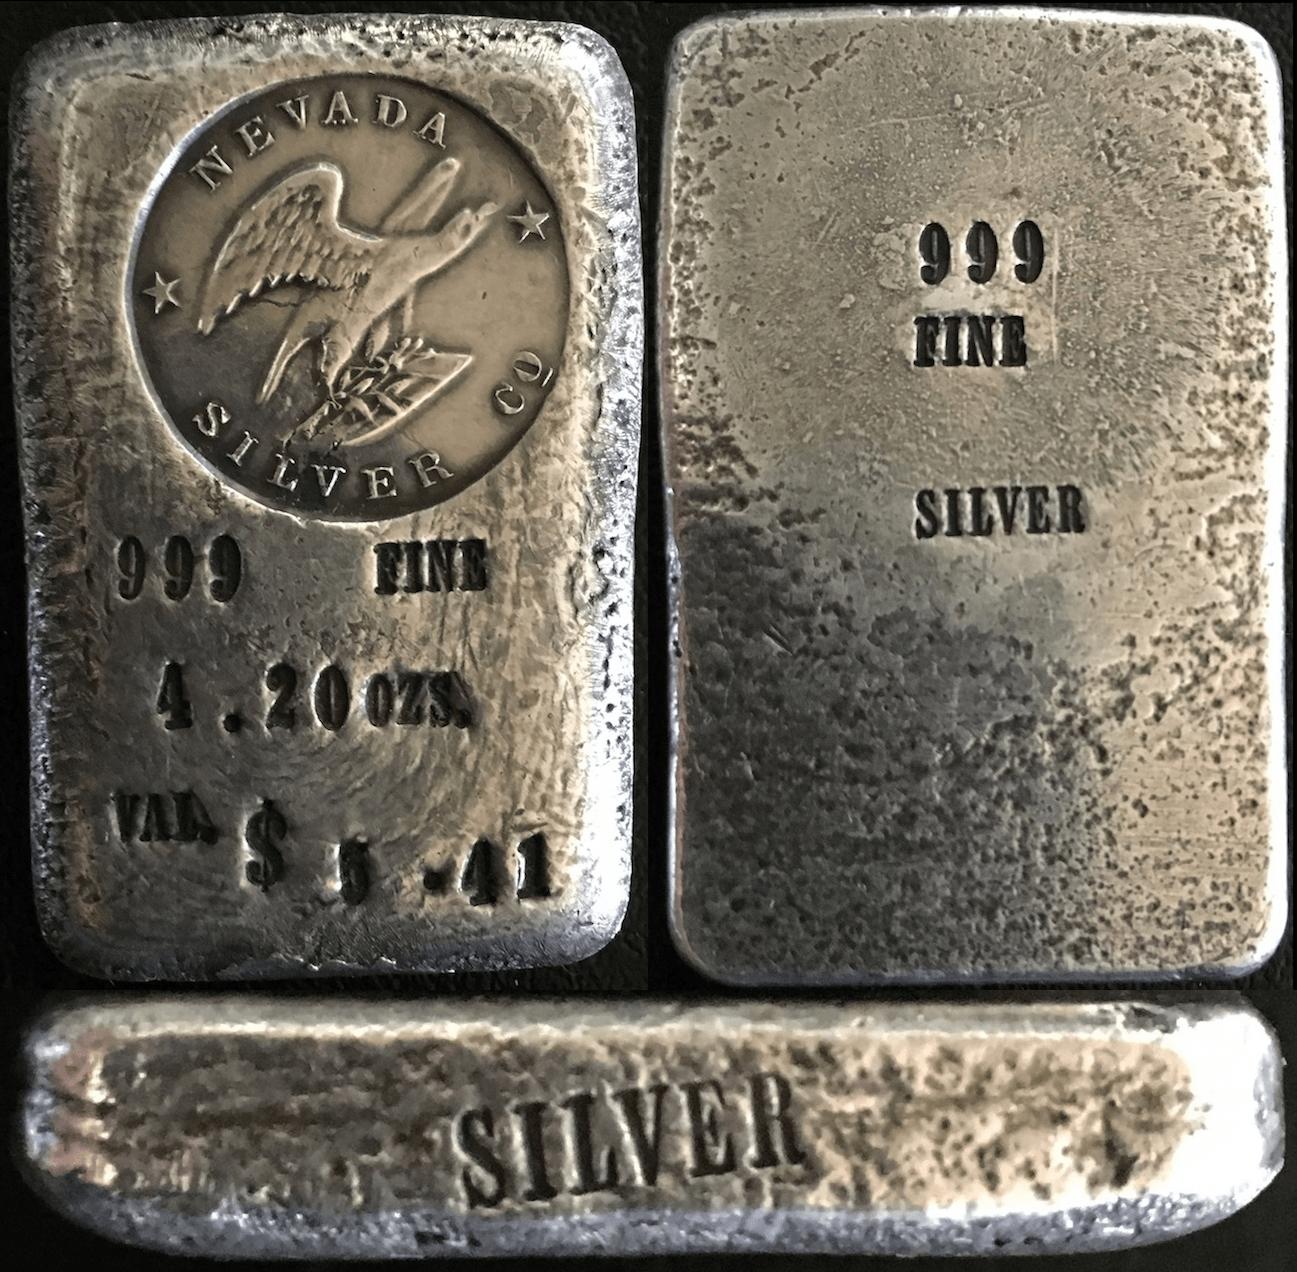 Nevada Silver Company